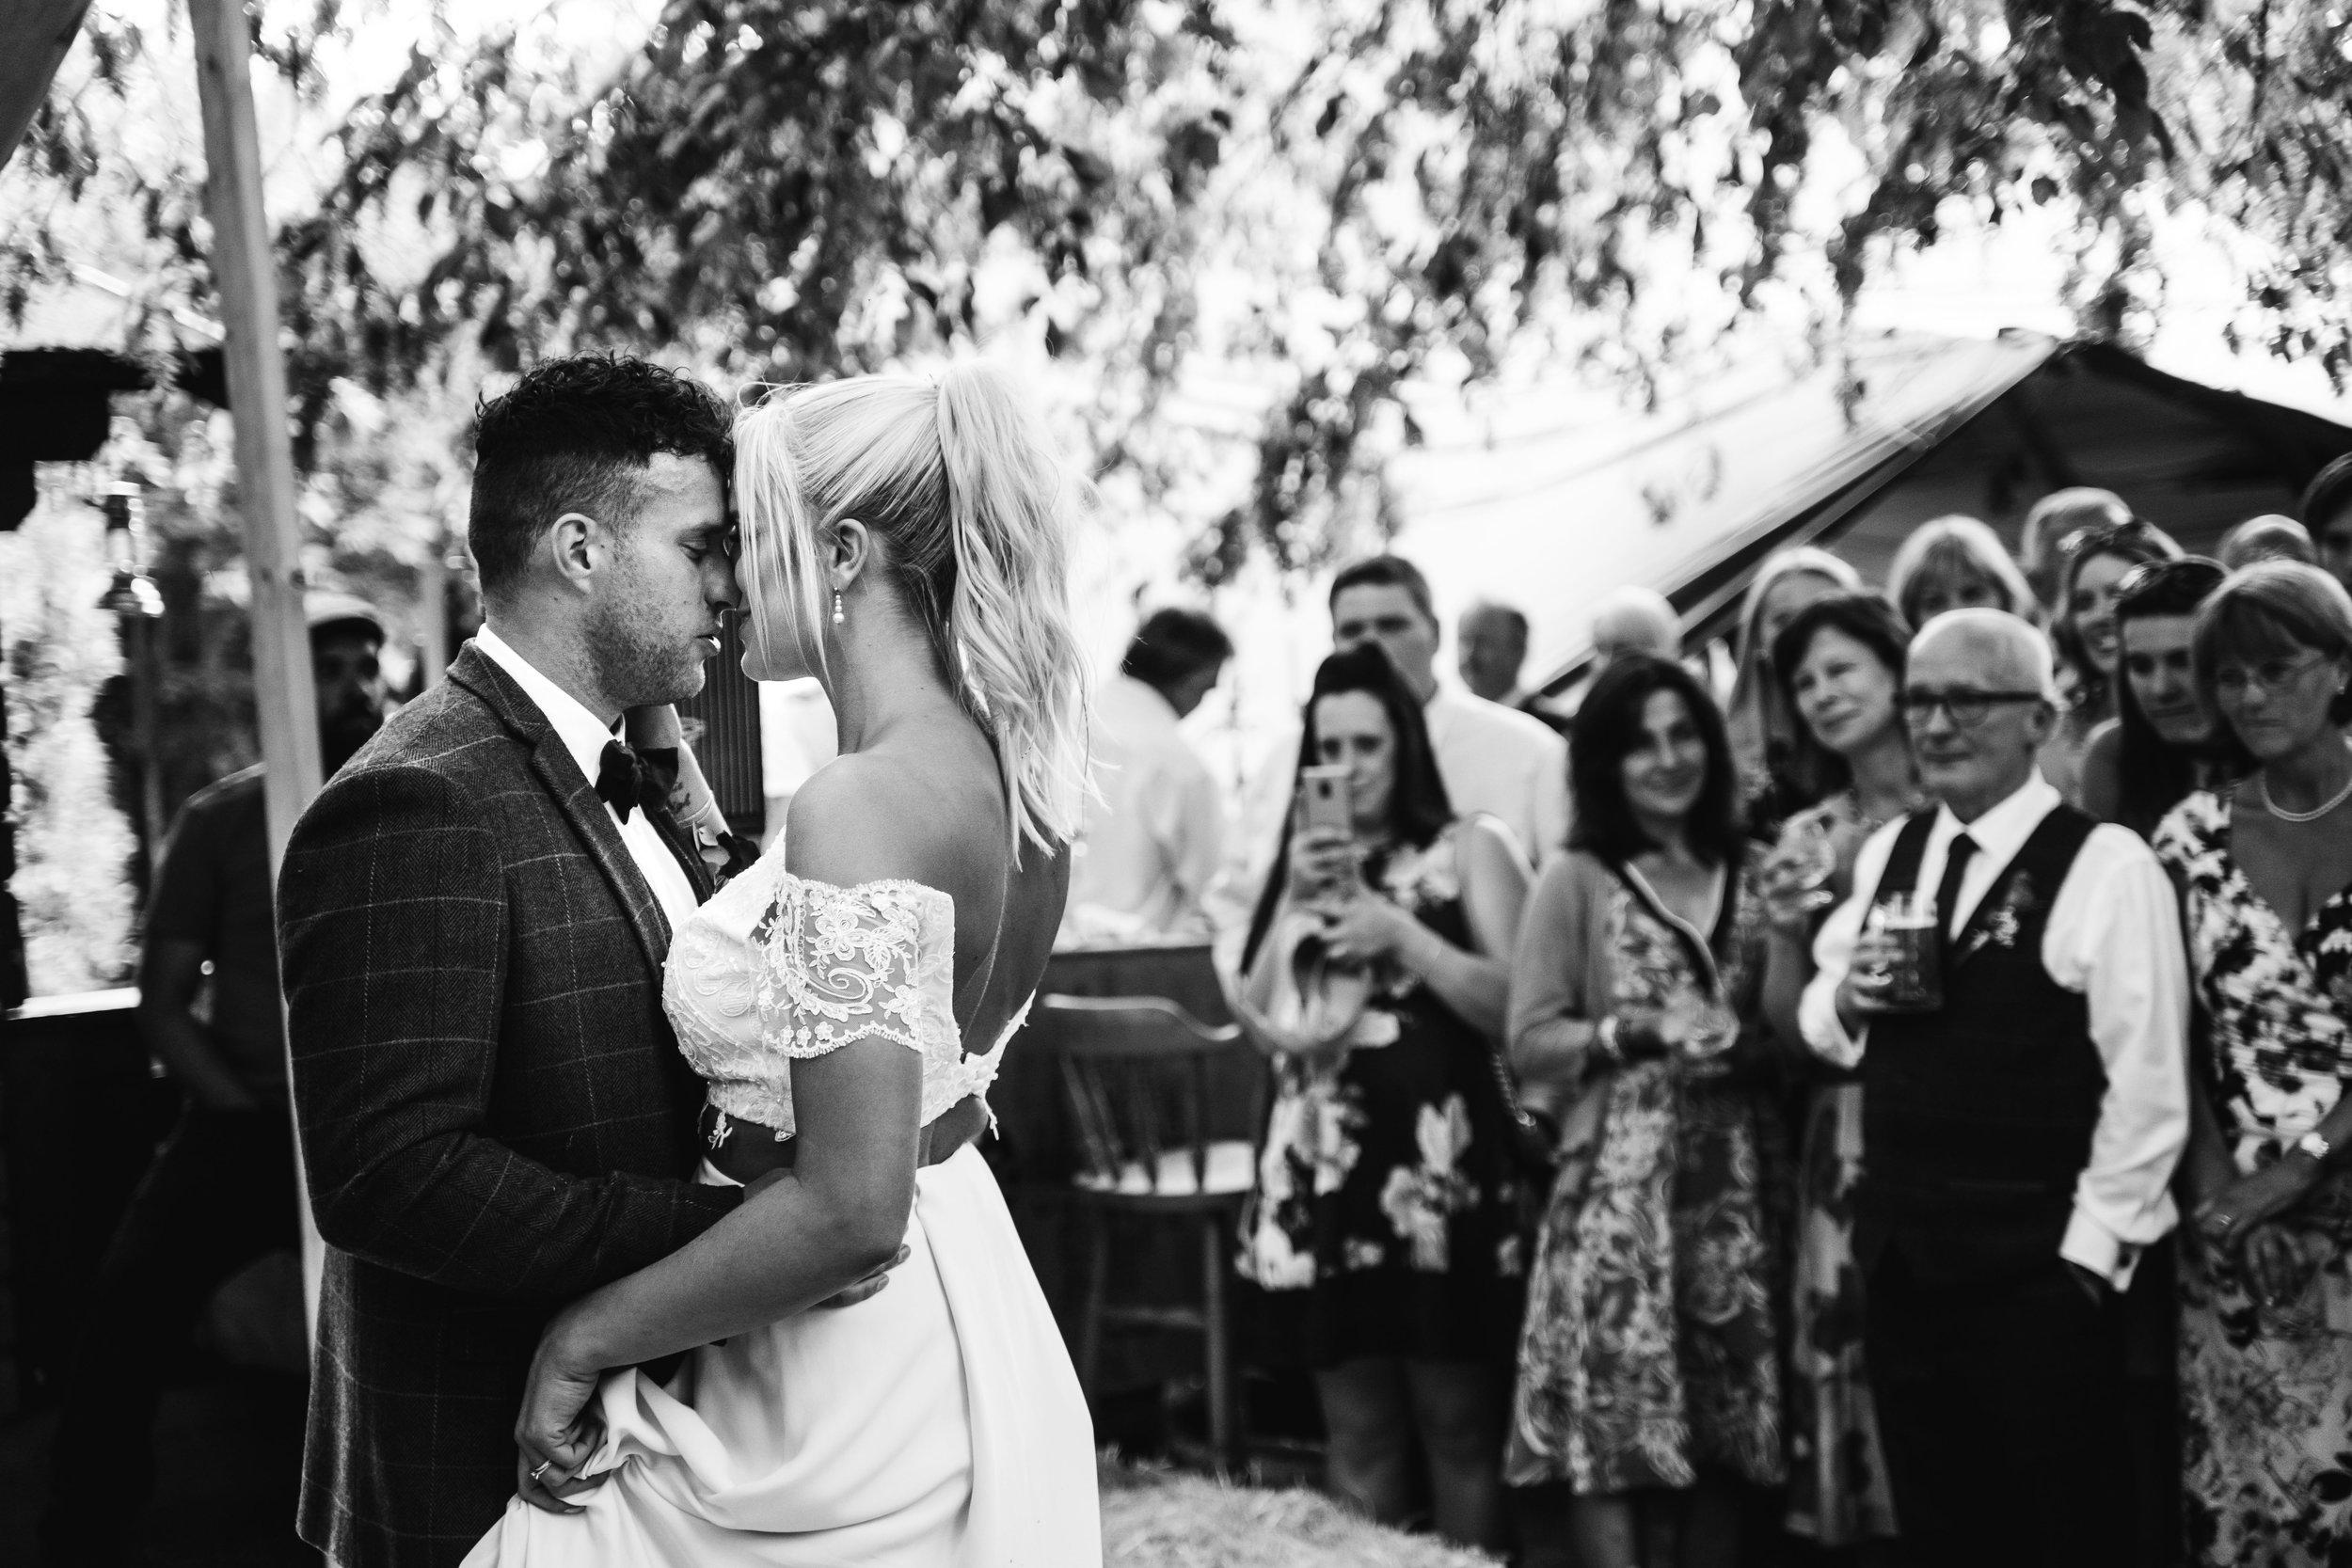 kent-wedding-photographer-105643.jpg